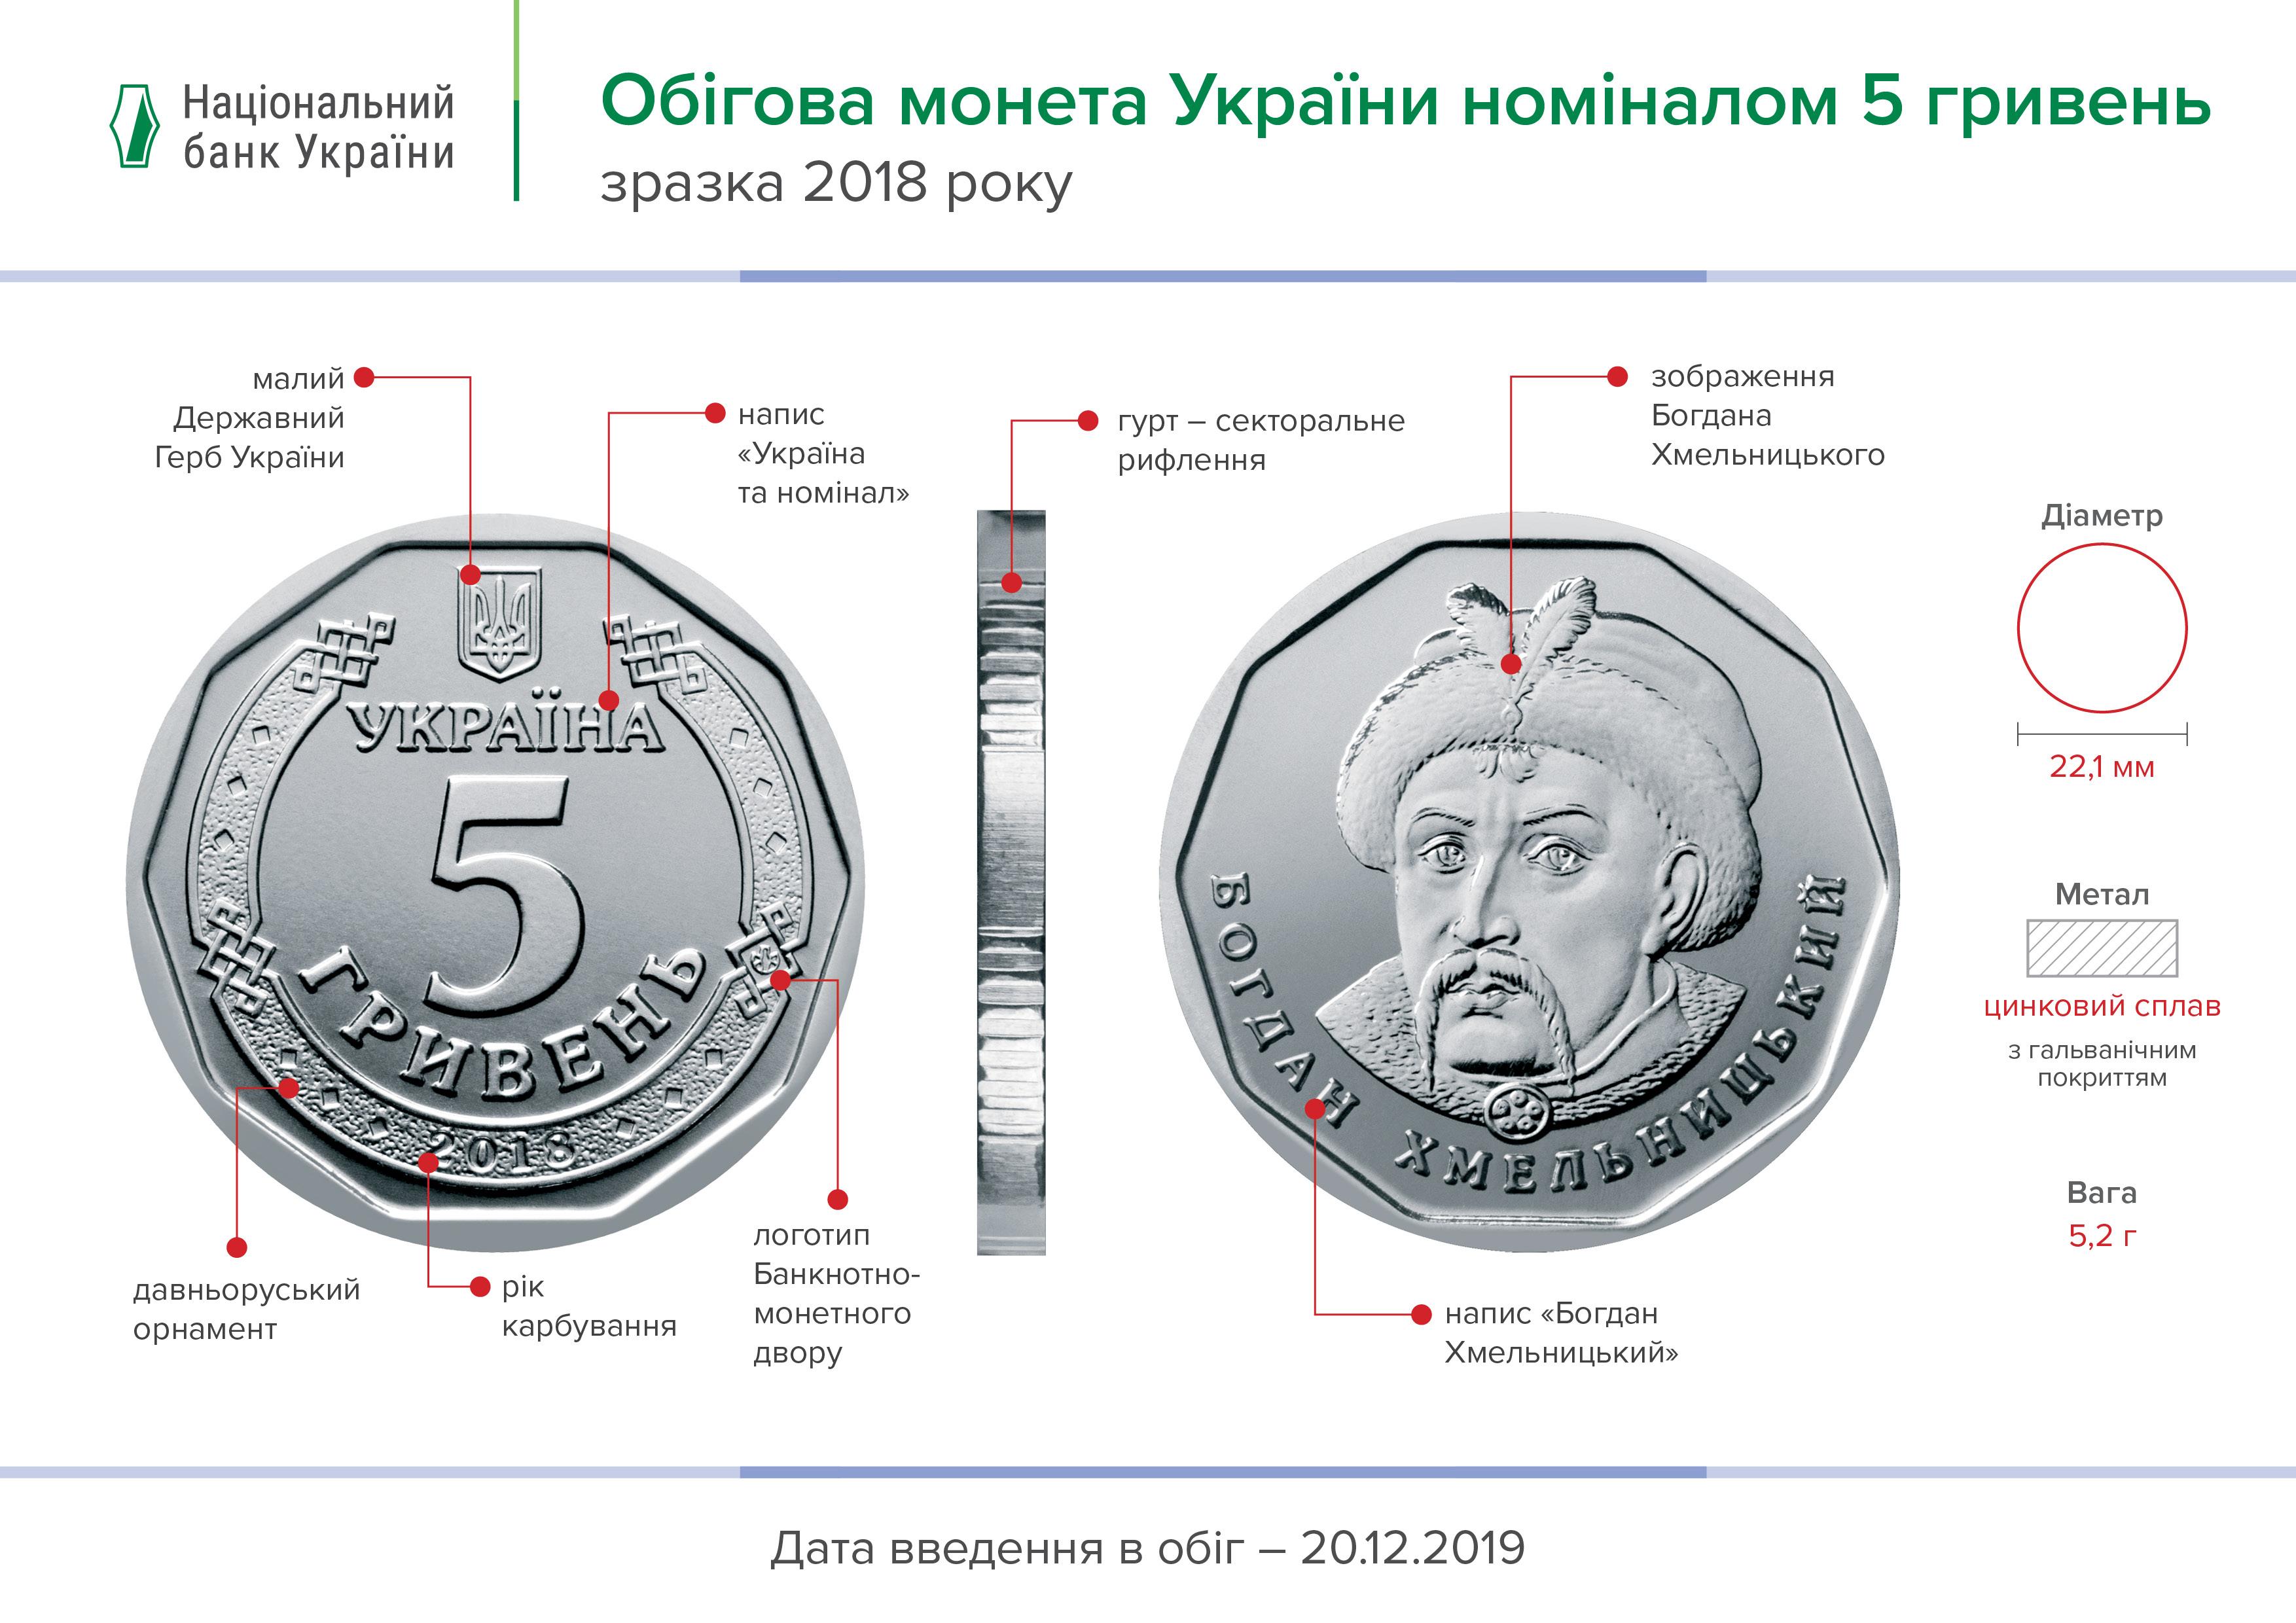 https://newcoins.bank.gov.ua/img/coins/5grn.jpg